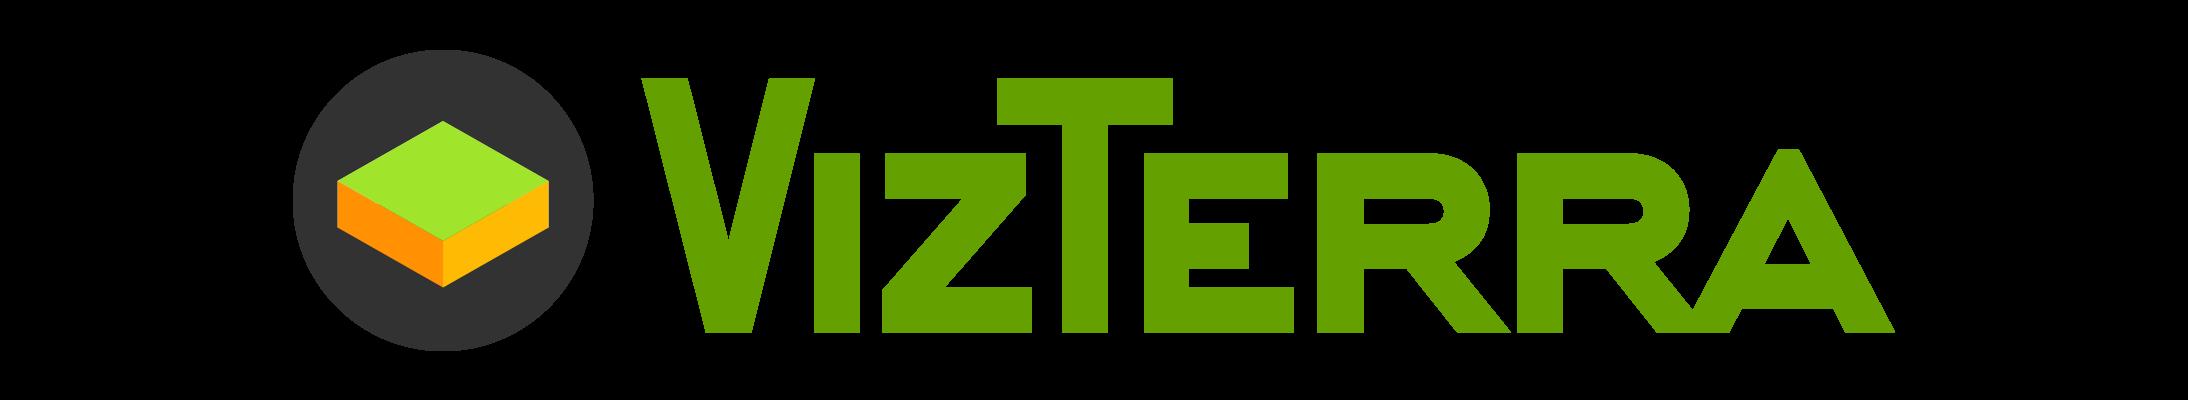 VizTerra_logo